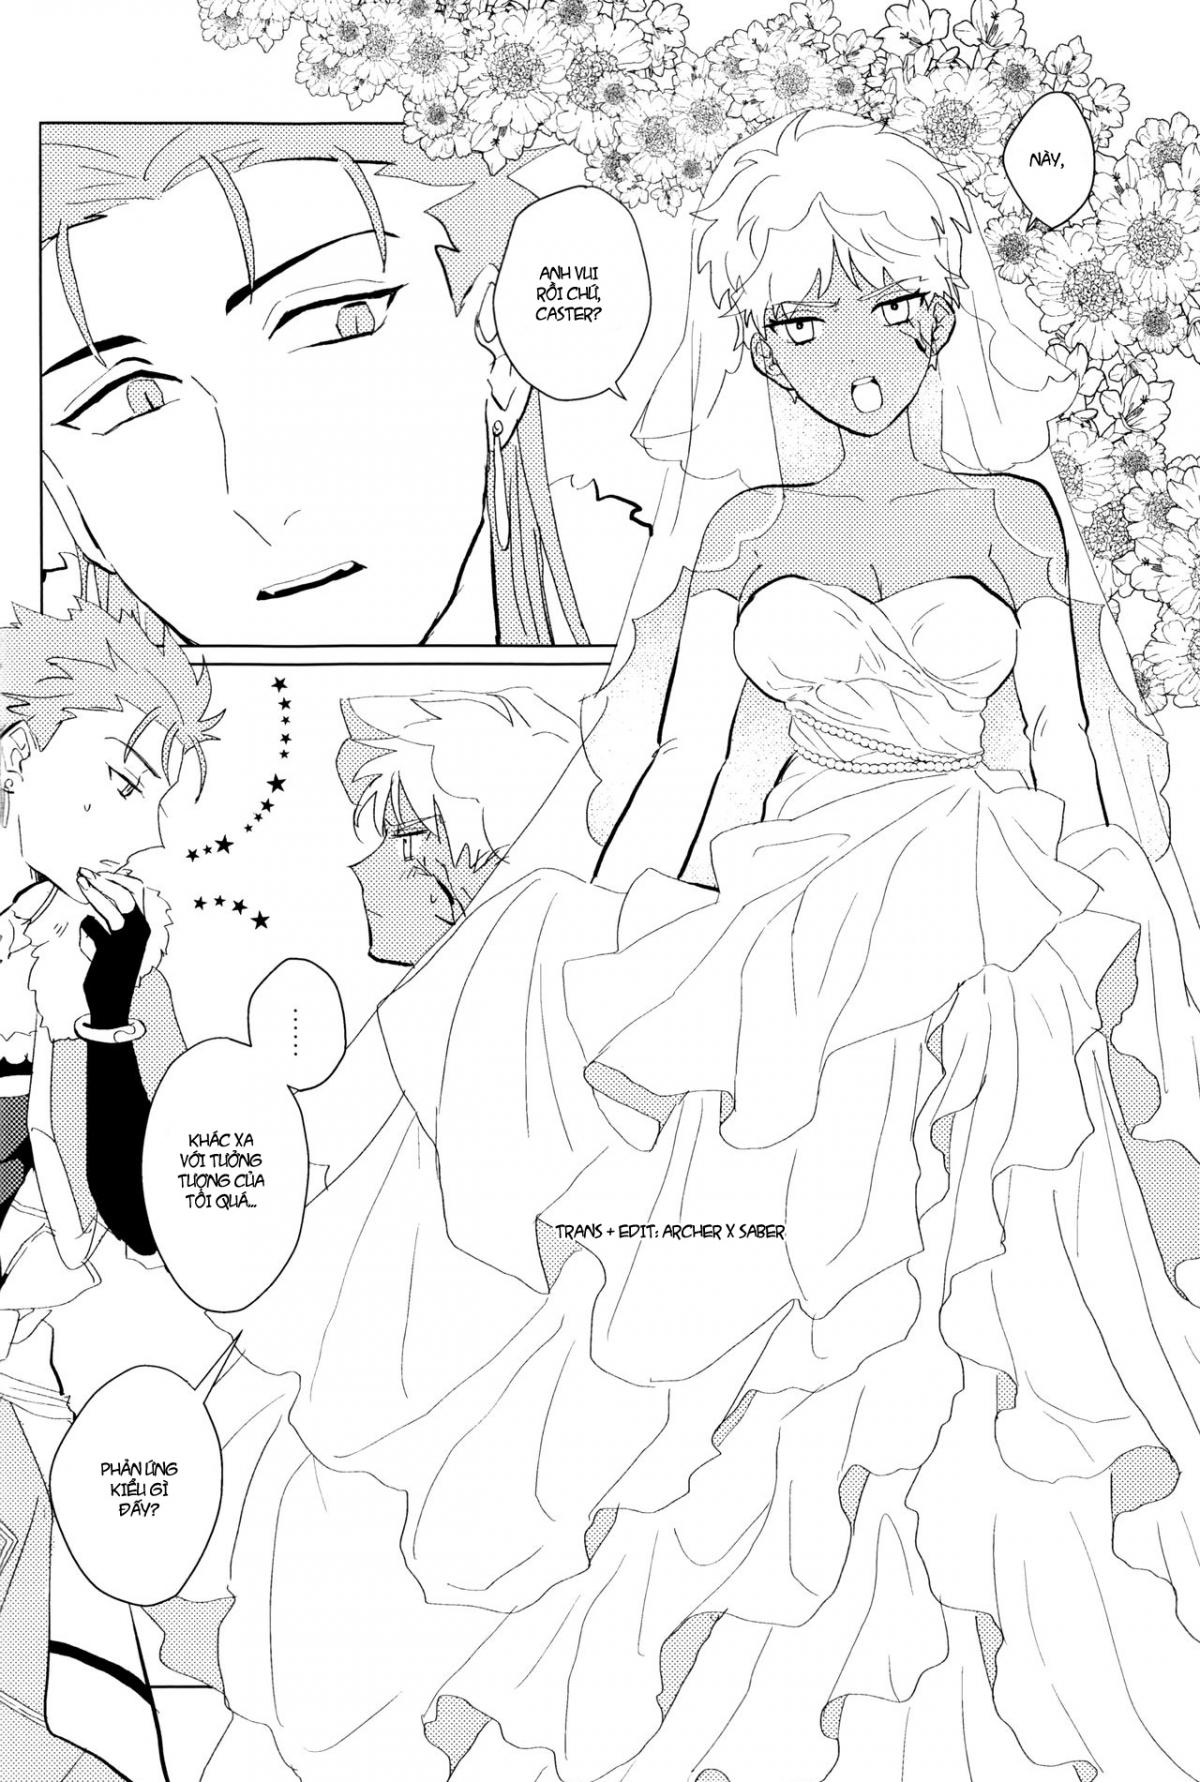 HentaiVN.net - Ảnh 13 - Seventh Heavens Story (Fate/Grand Order) - Oneshot